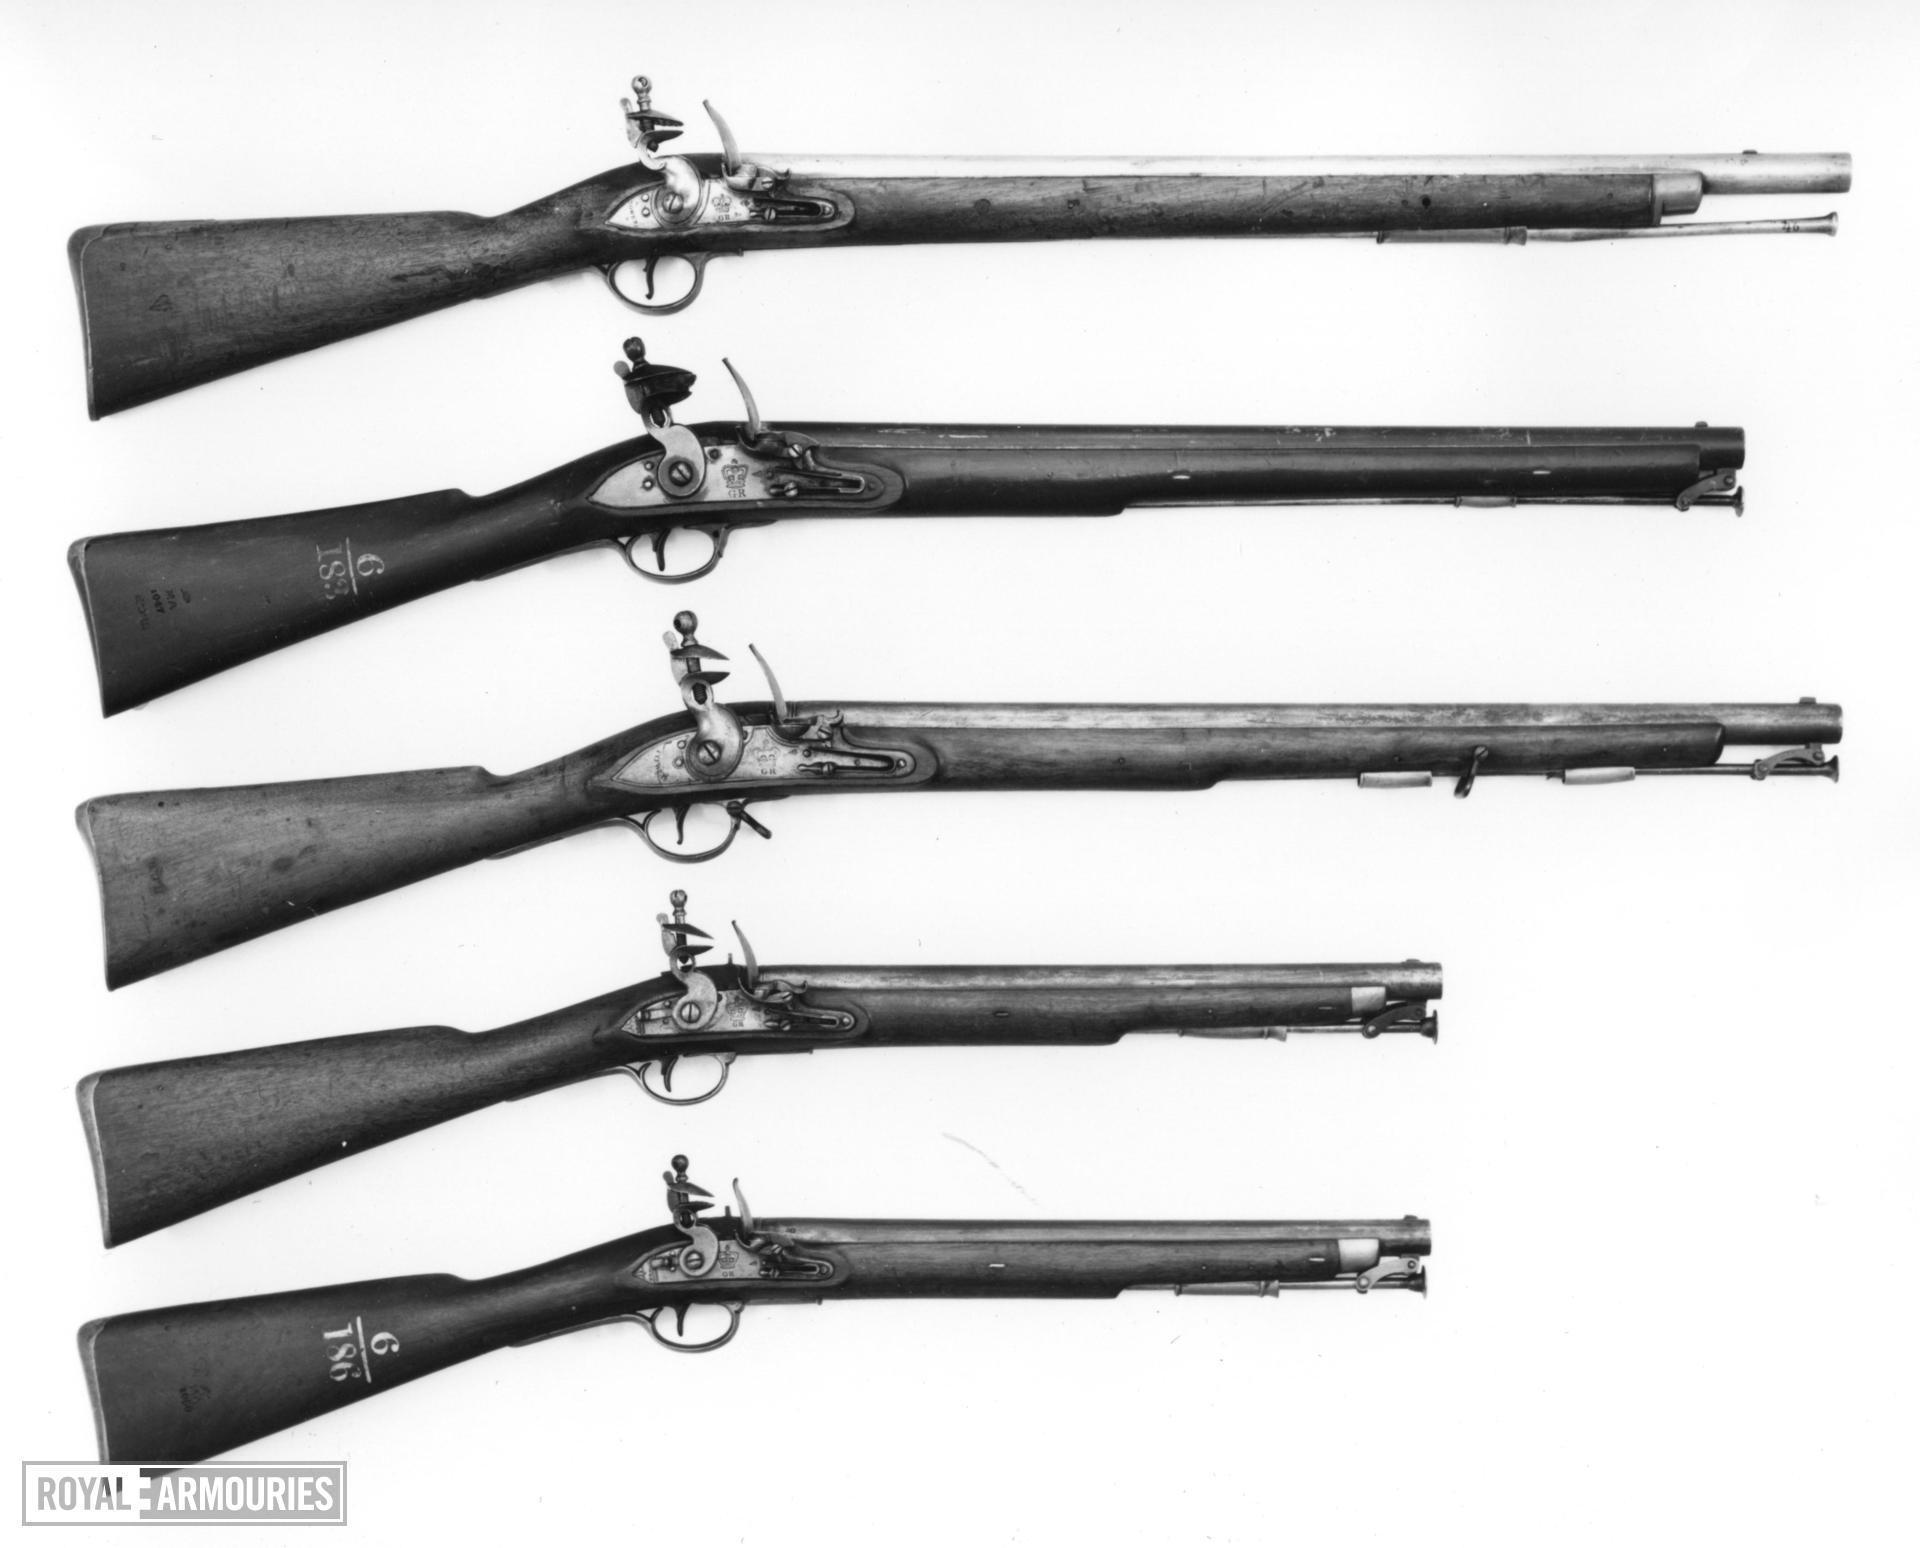 Flintlock muzzle-loading military carbine - Pattern 1805 Paget Carbine Light Cavalry model